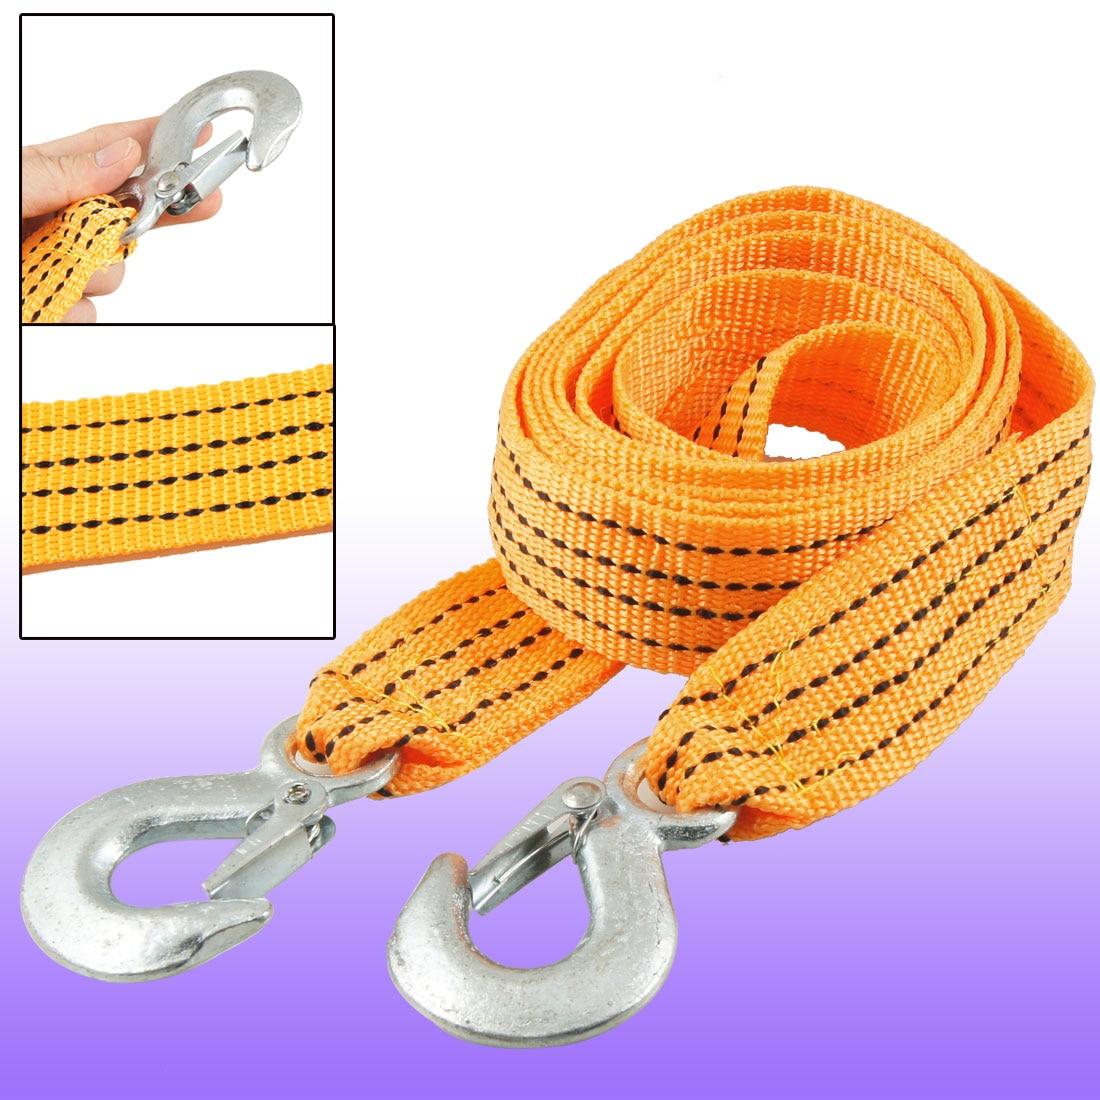 UXCELL Auto Car 3 Ton Capacity Hook Clasp Orange Black Nylon Tow Rope 2.5M